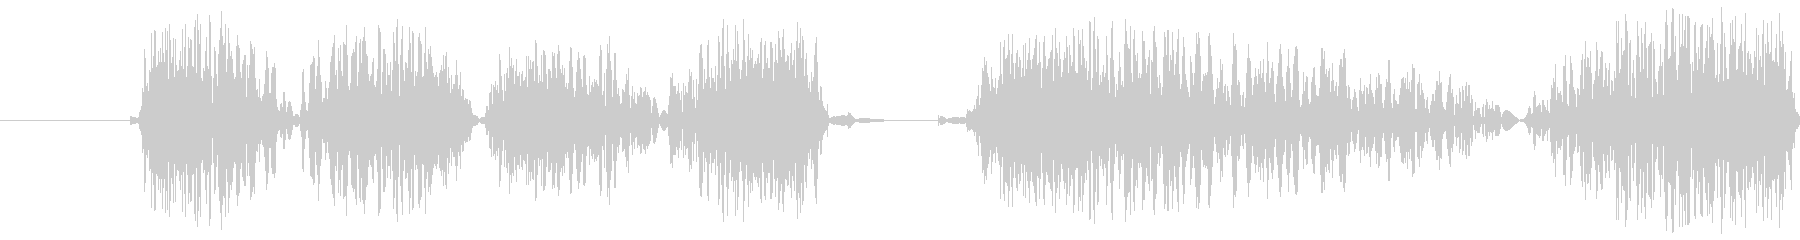 Dj Flutter Scratc...の未再生の波形